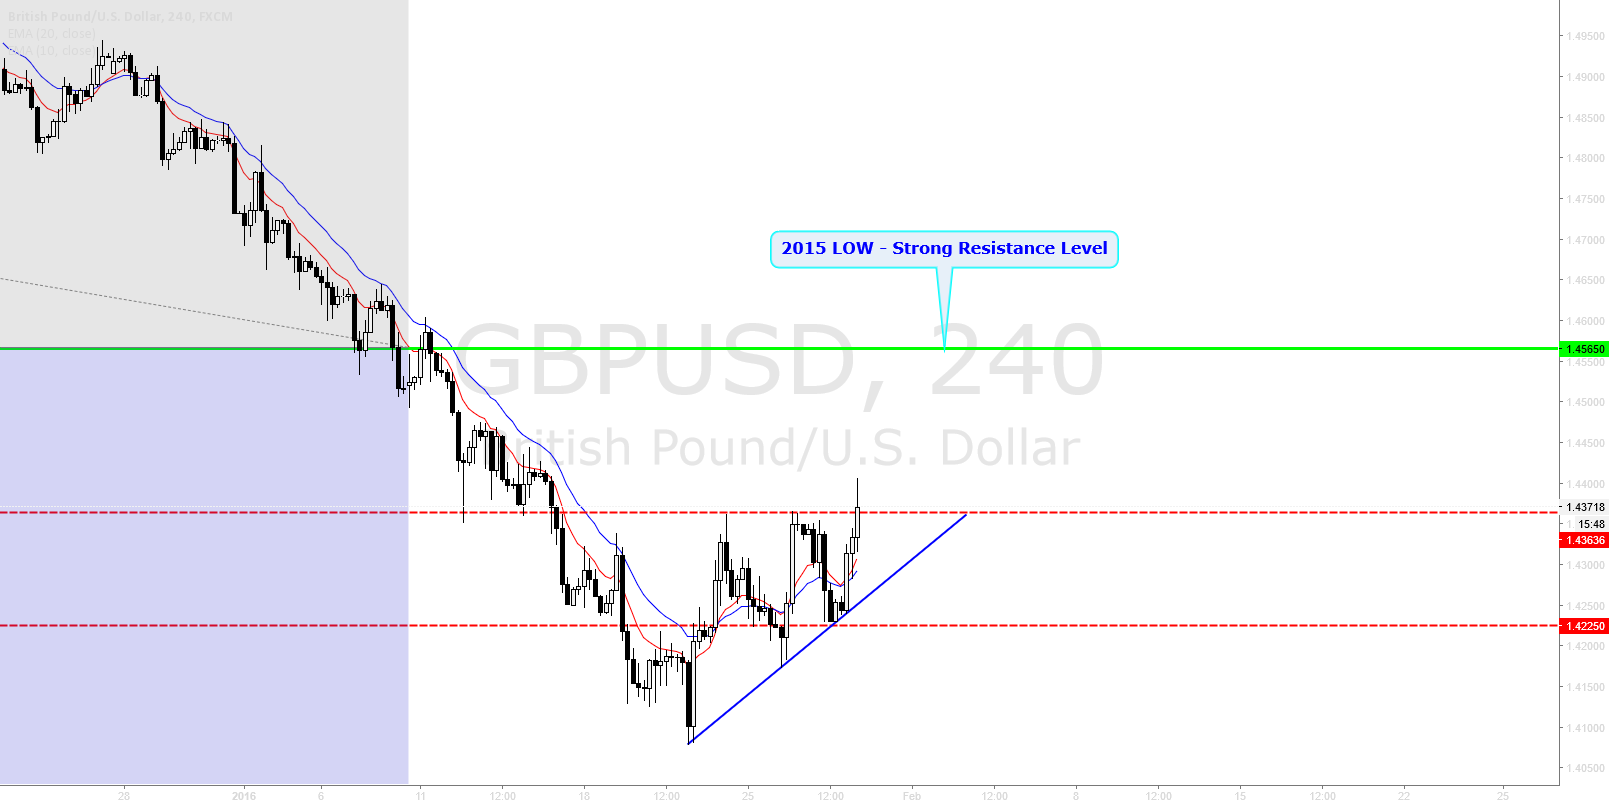 GBPUSD Bullish Retracement.  Waiting for close above 1.4360